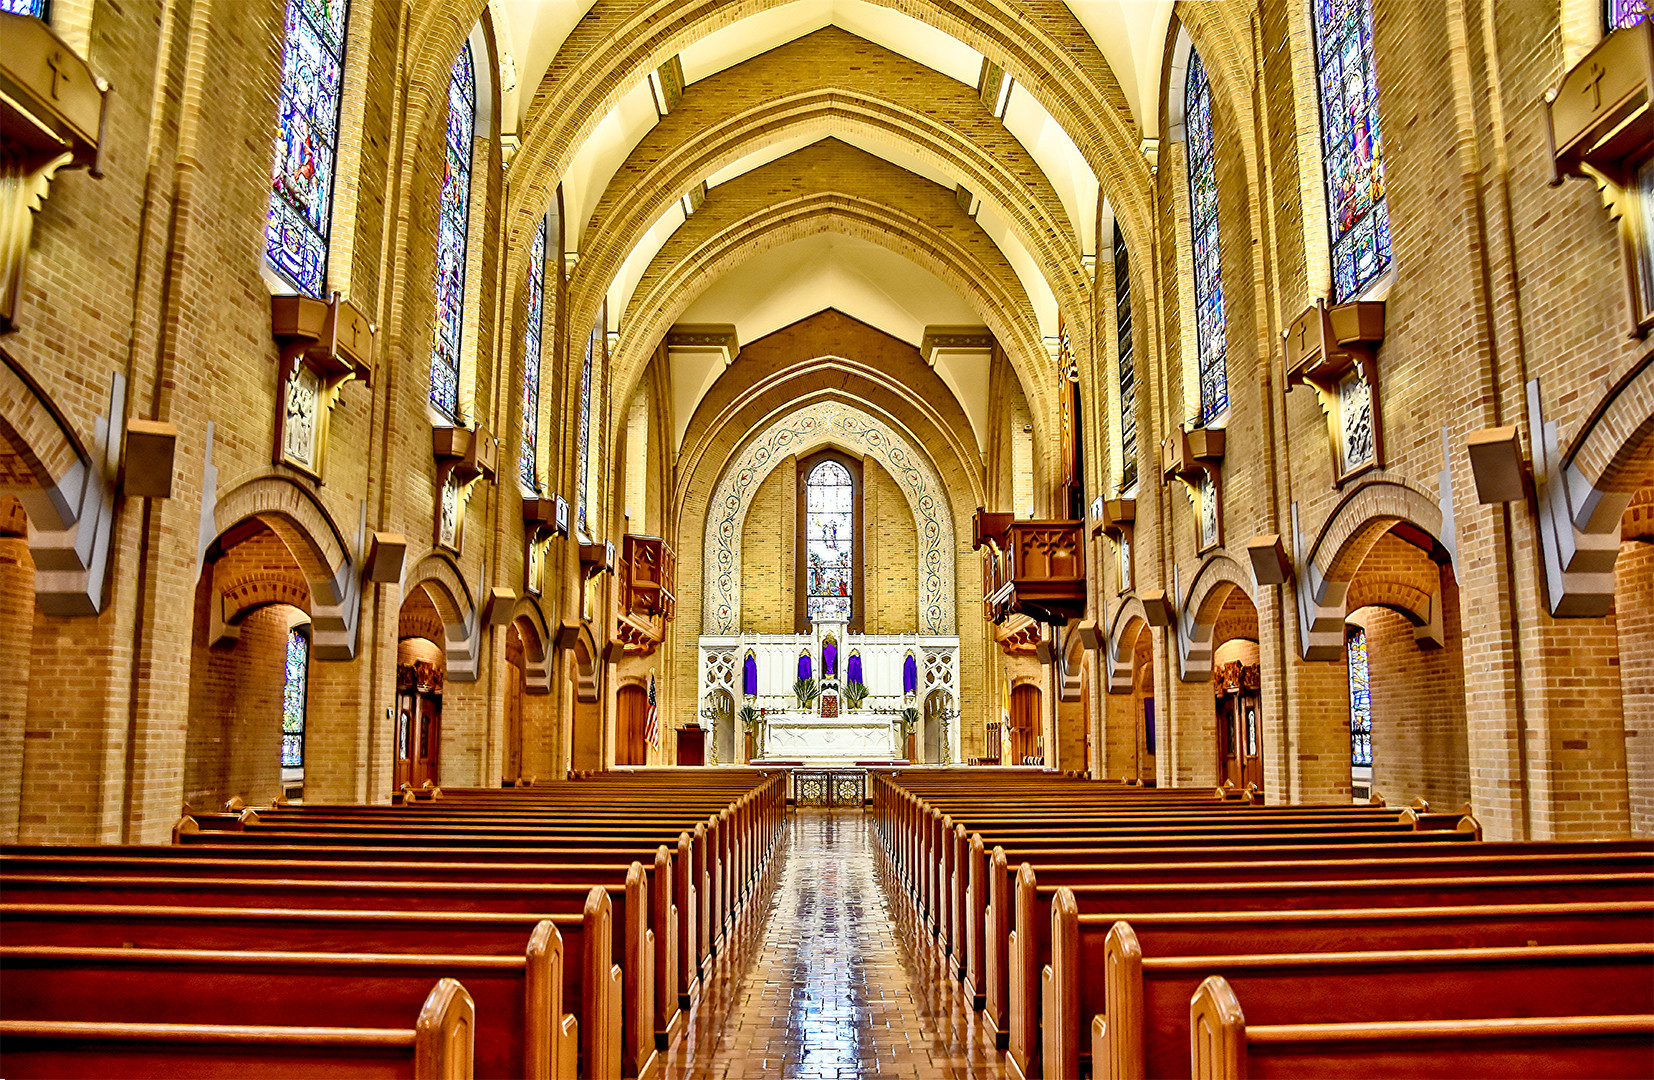 Our Lady of Grace Church – Our Lady of Grace Church